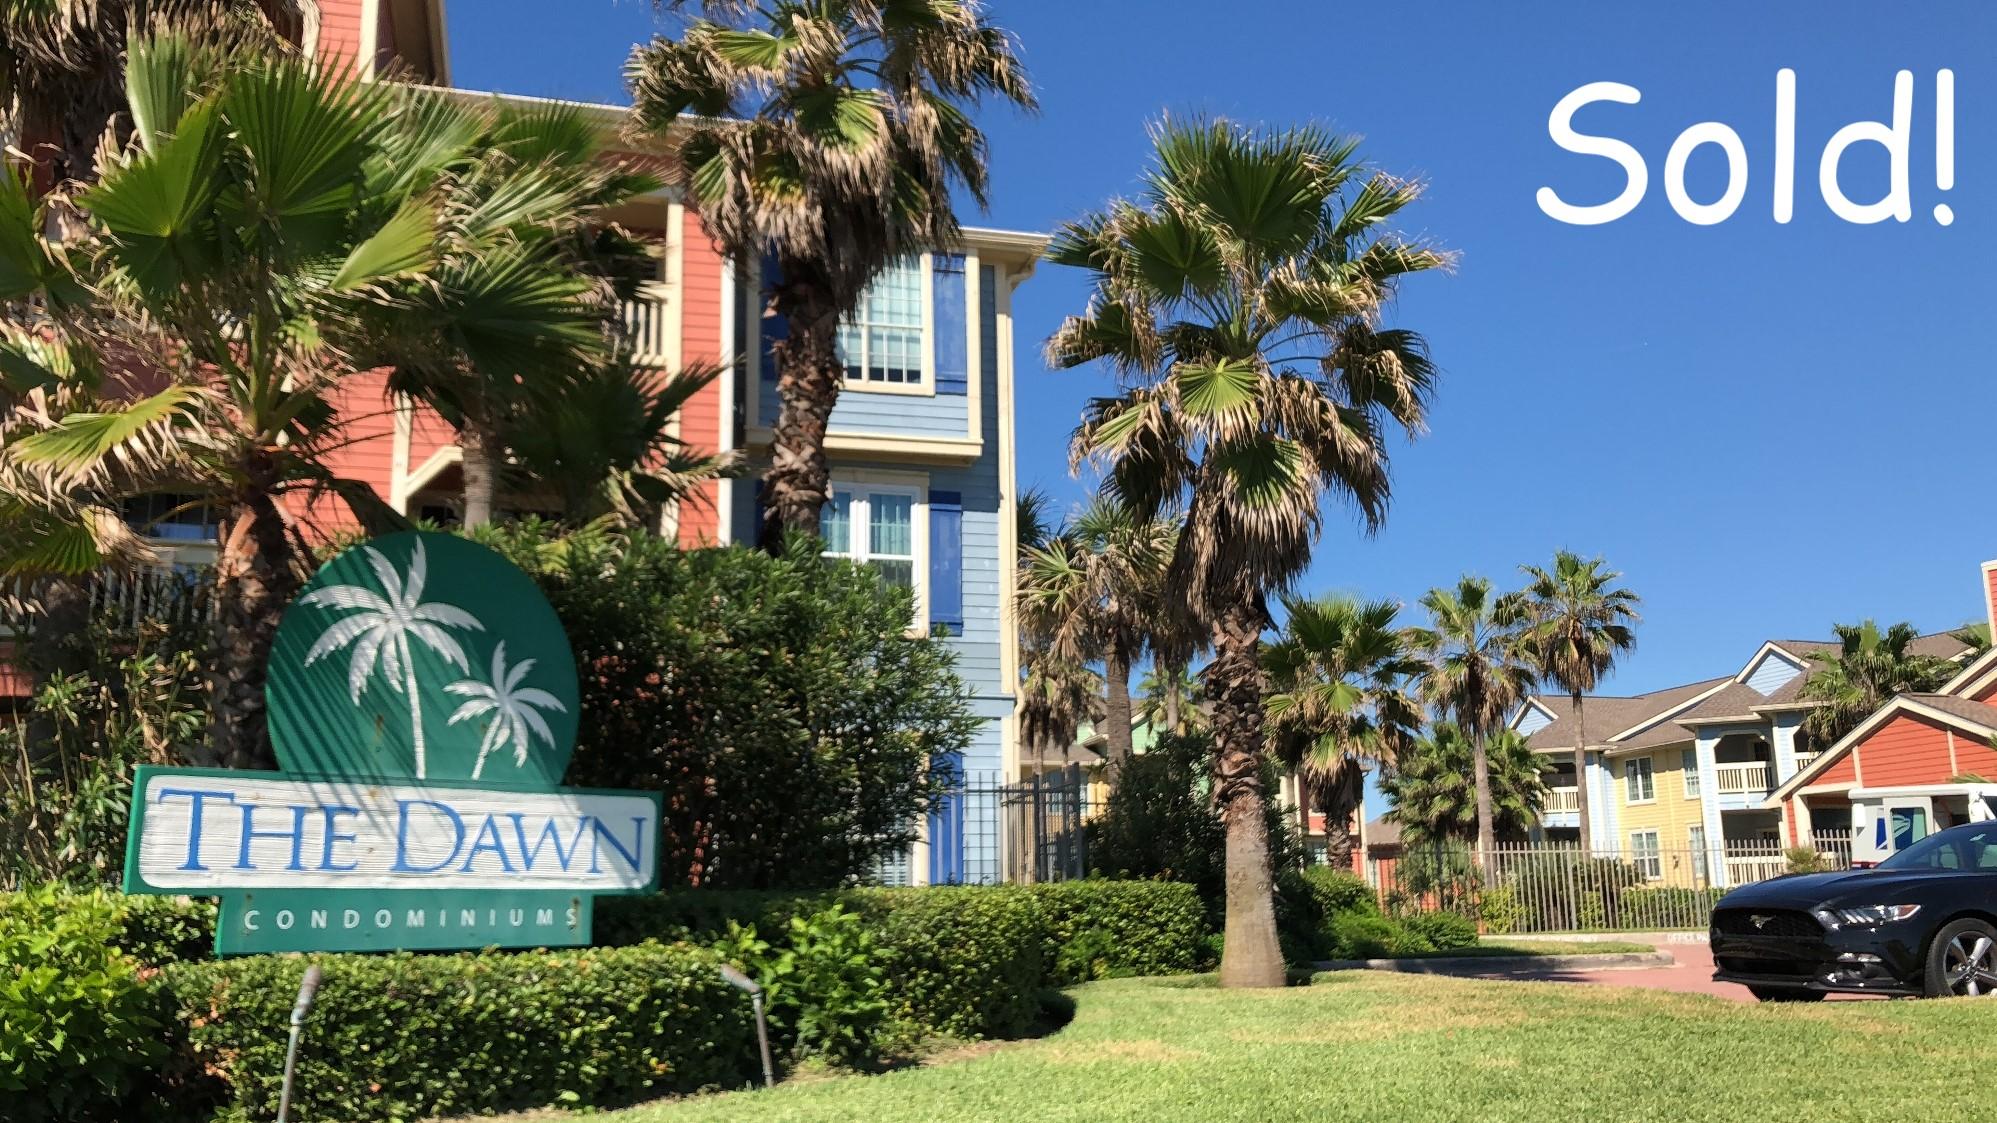 Dawn Condominiums Galveston Sold